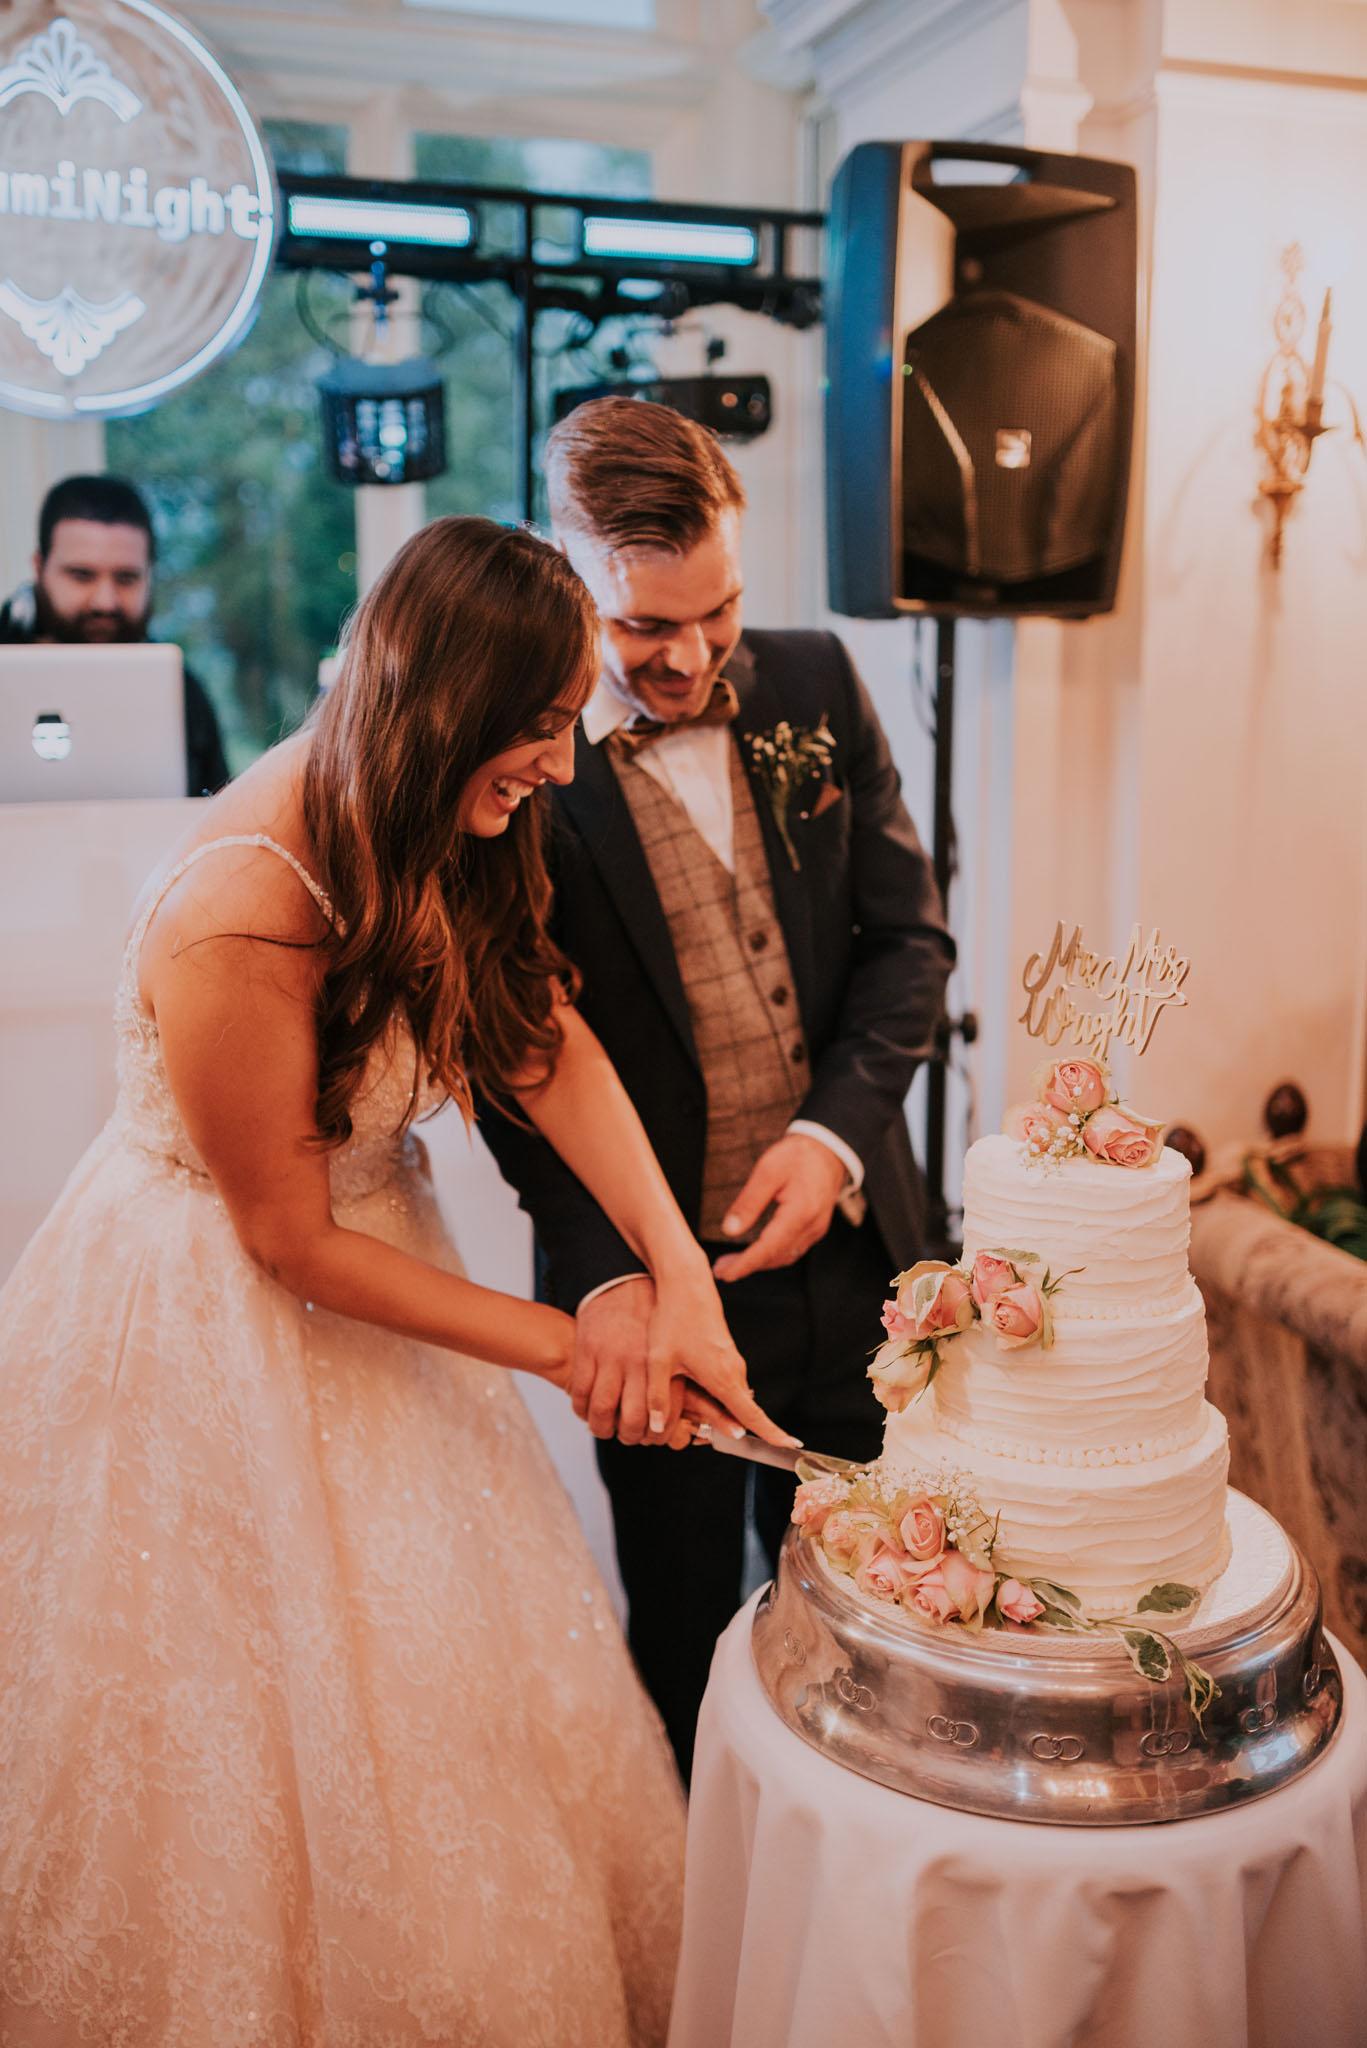 wedding-photographer-glewstone-court-hereford-scott-stockwell-photography480.jpg